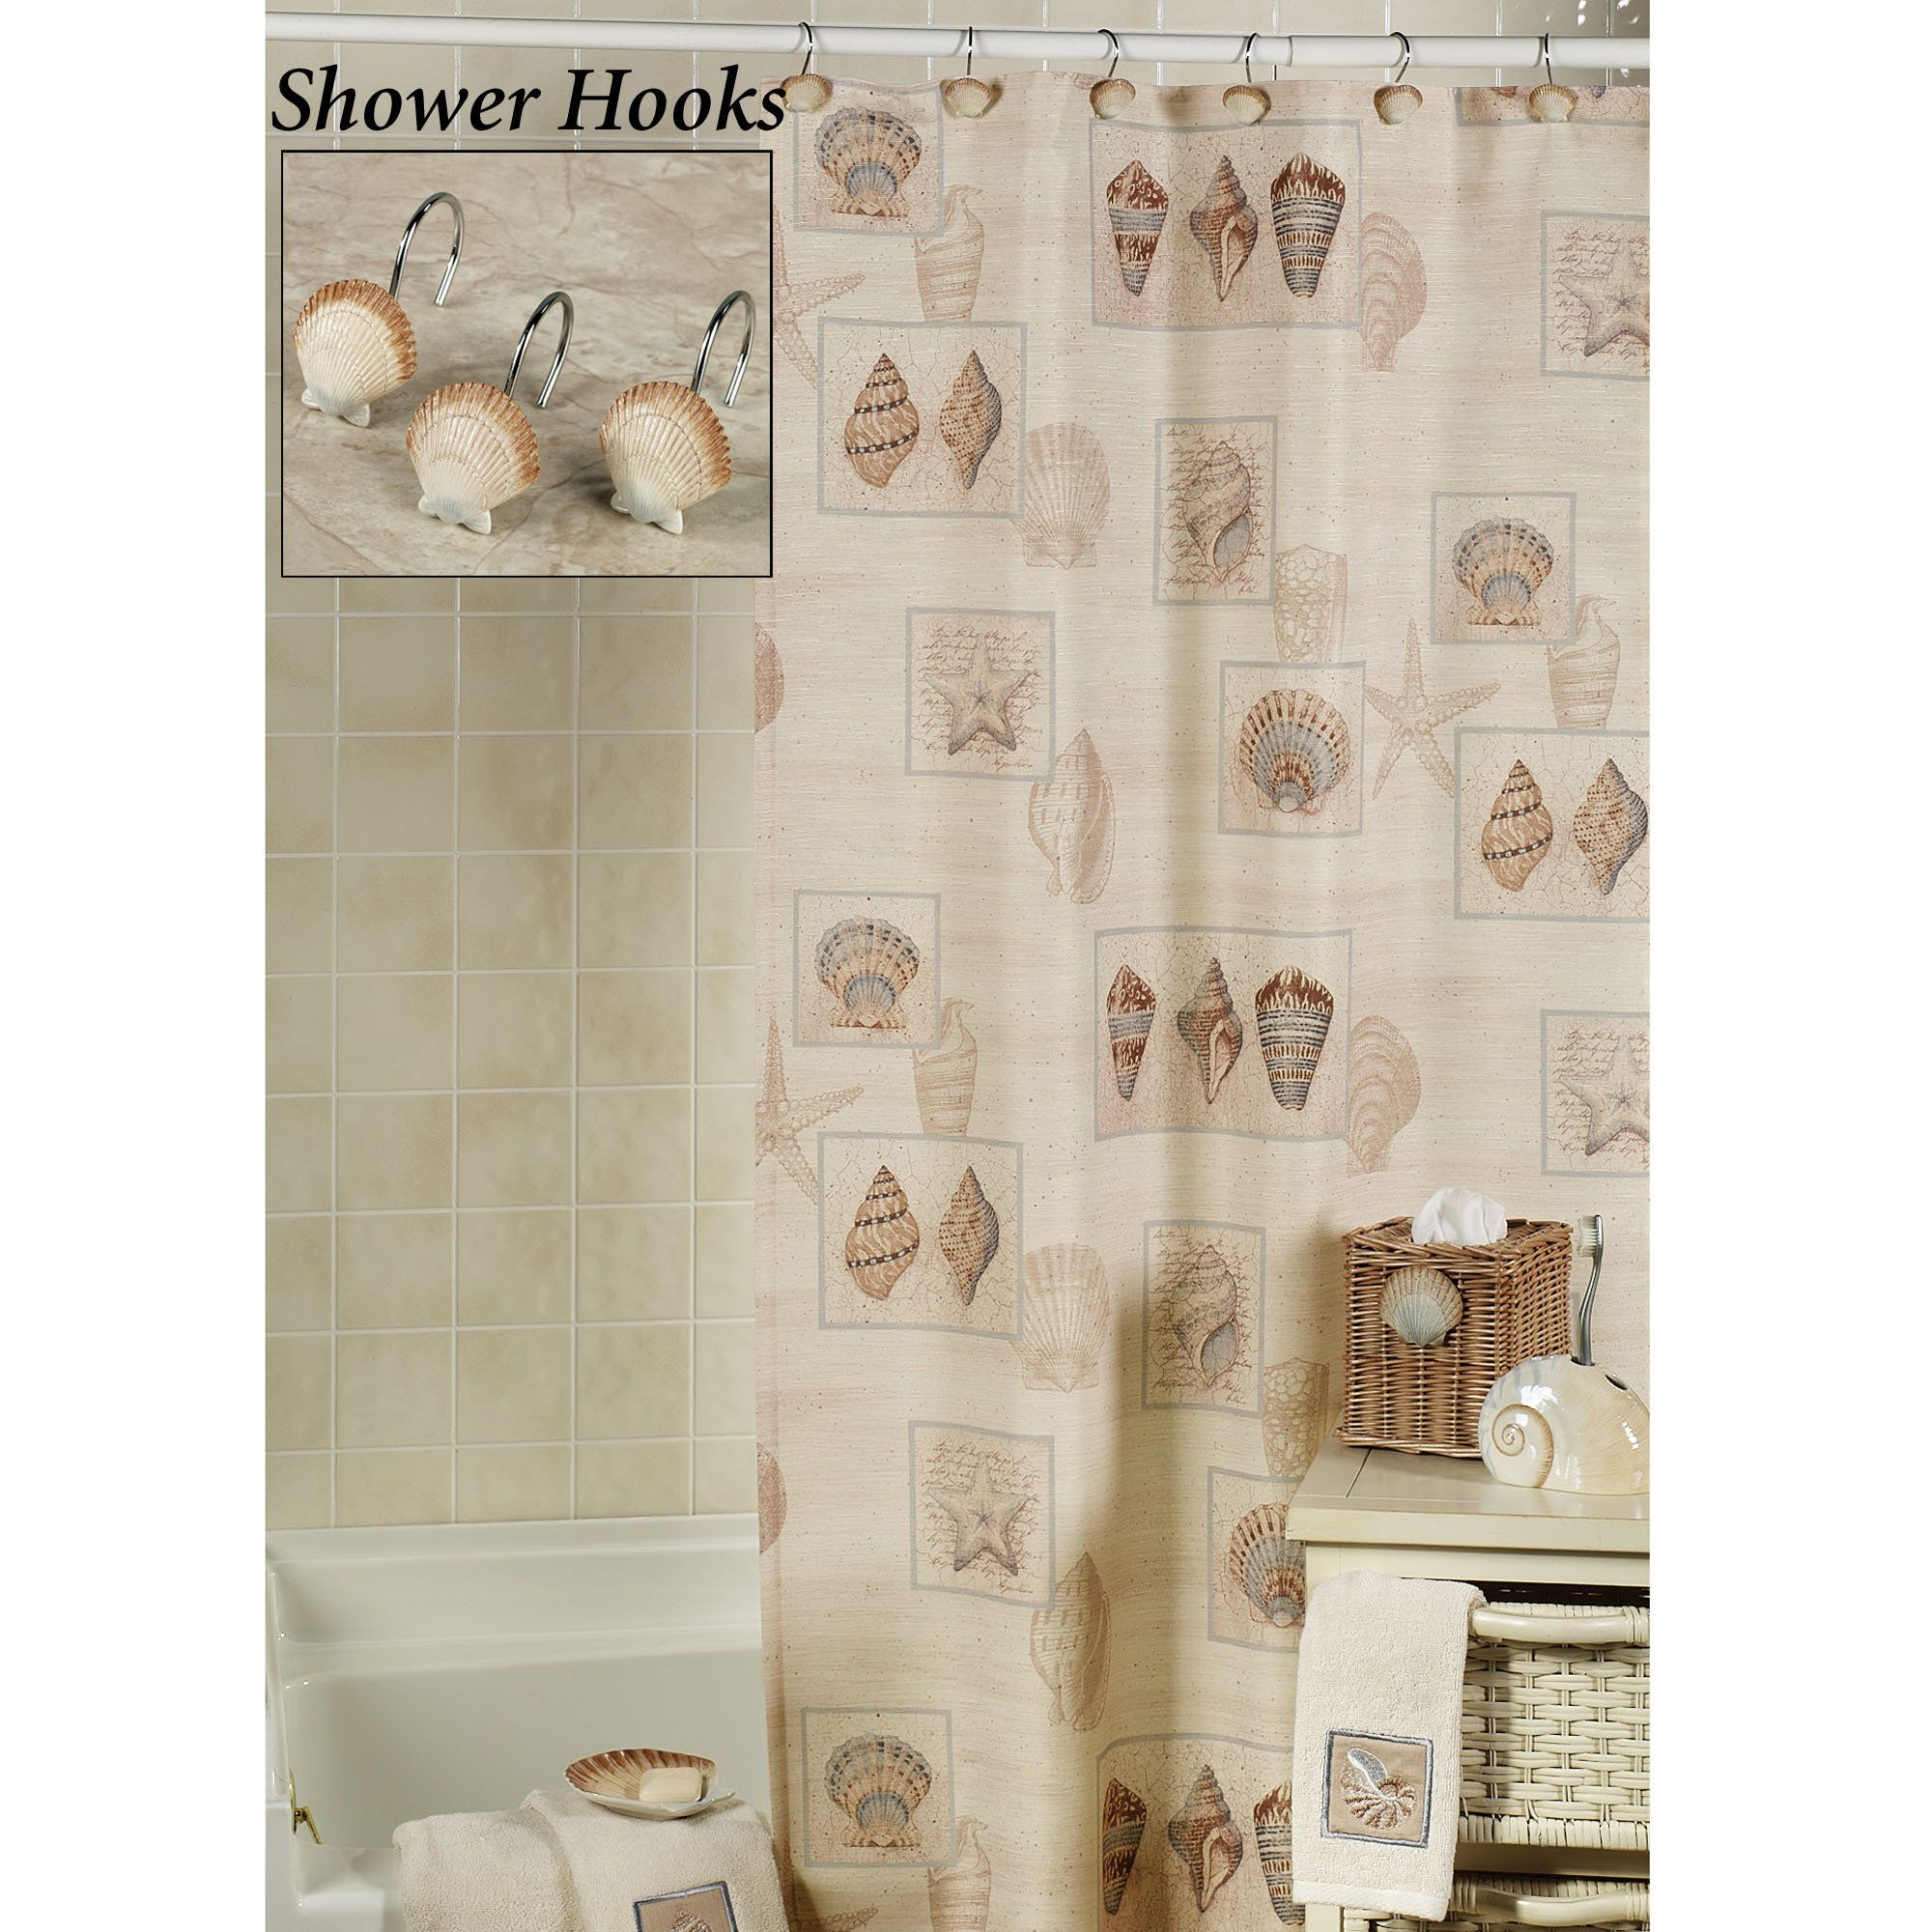 Seashell bathroom ideas - Bathroom Designs Beach Shower Curtain The Sarasota Seashell Shower Curtain Will Bring The Beach Right Into